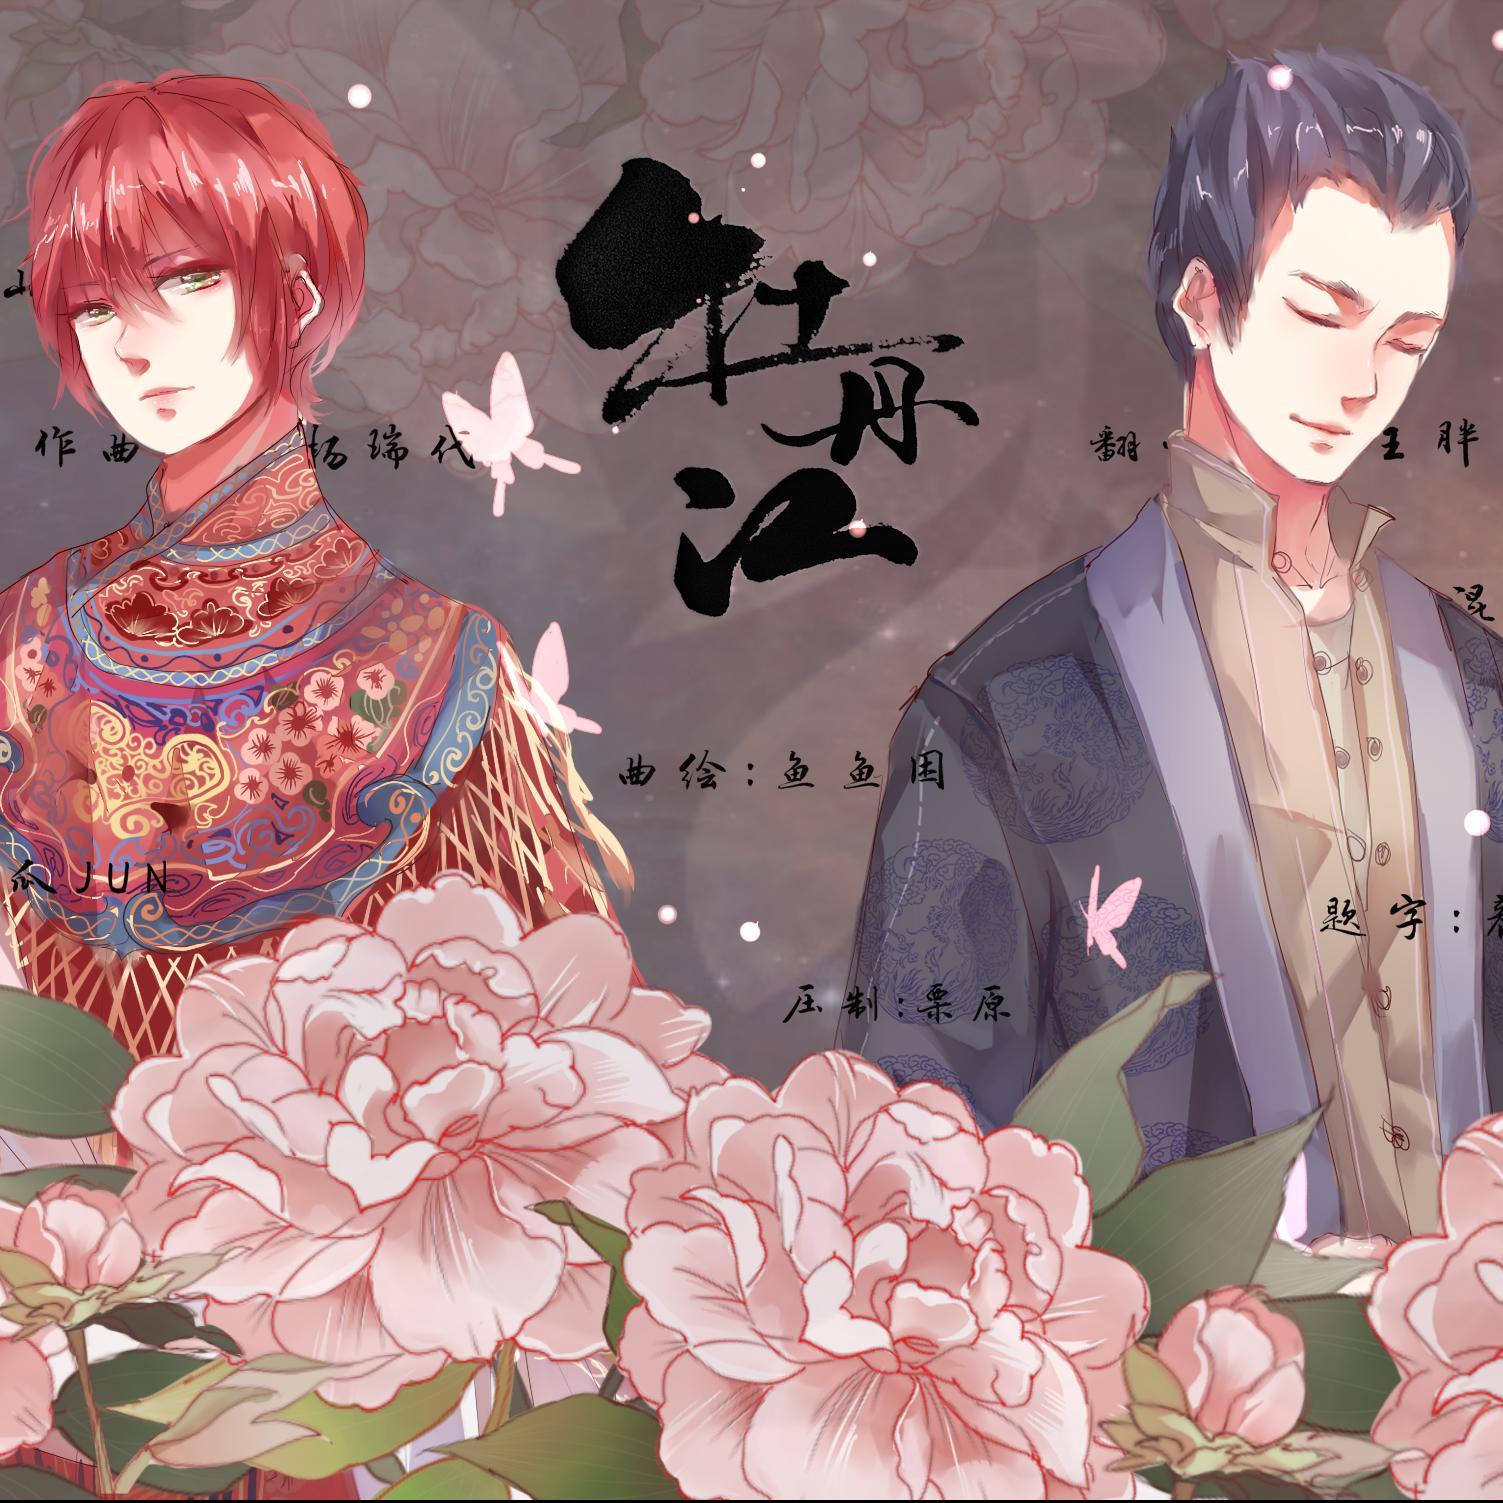 【b站】【王胖子x西瓜jun】牡丹江